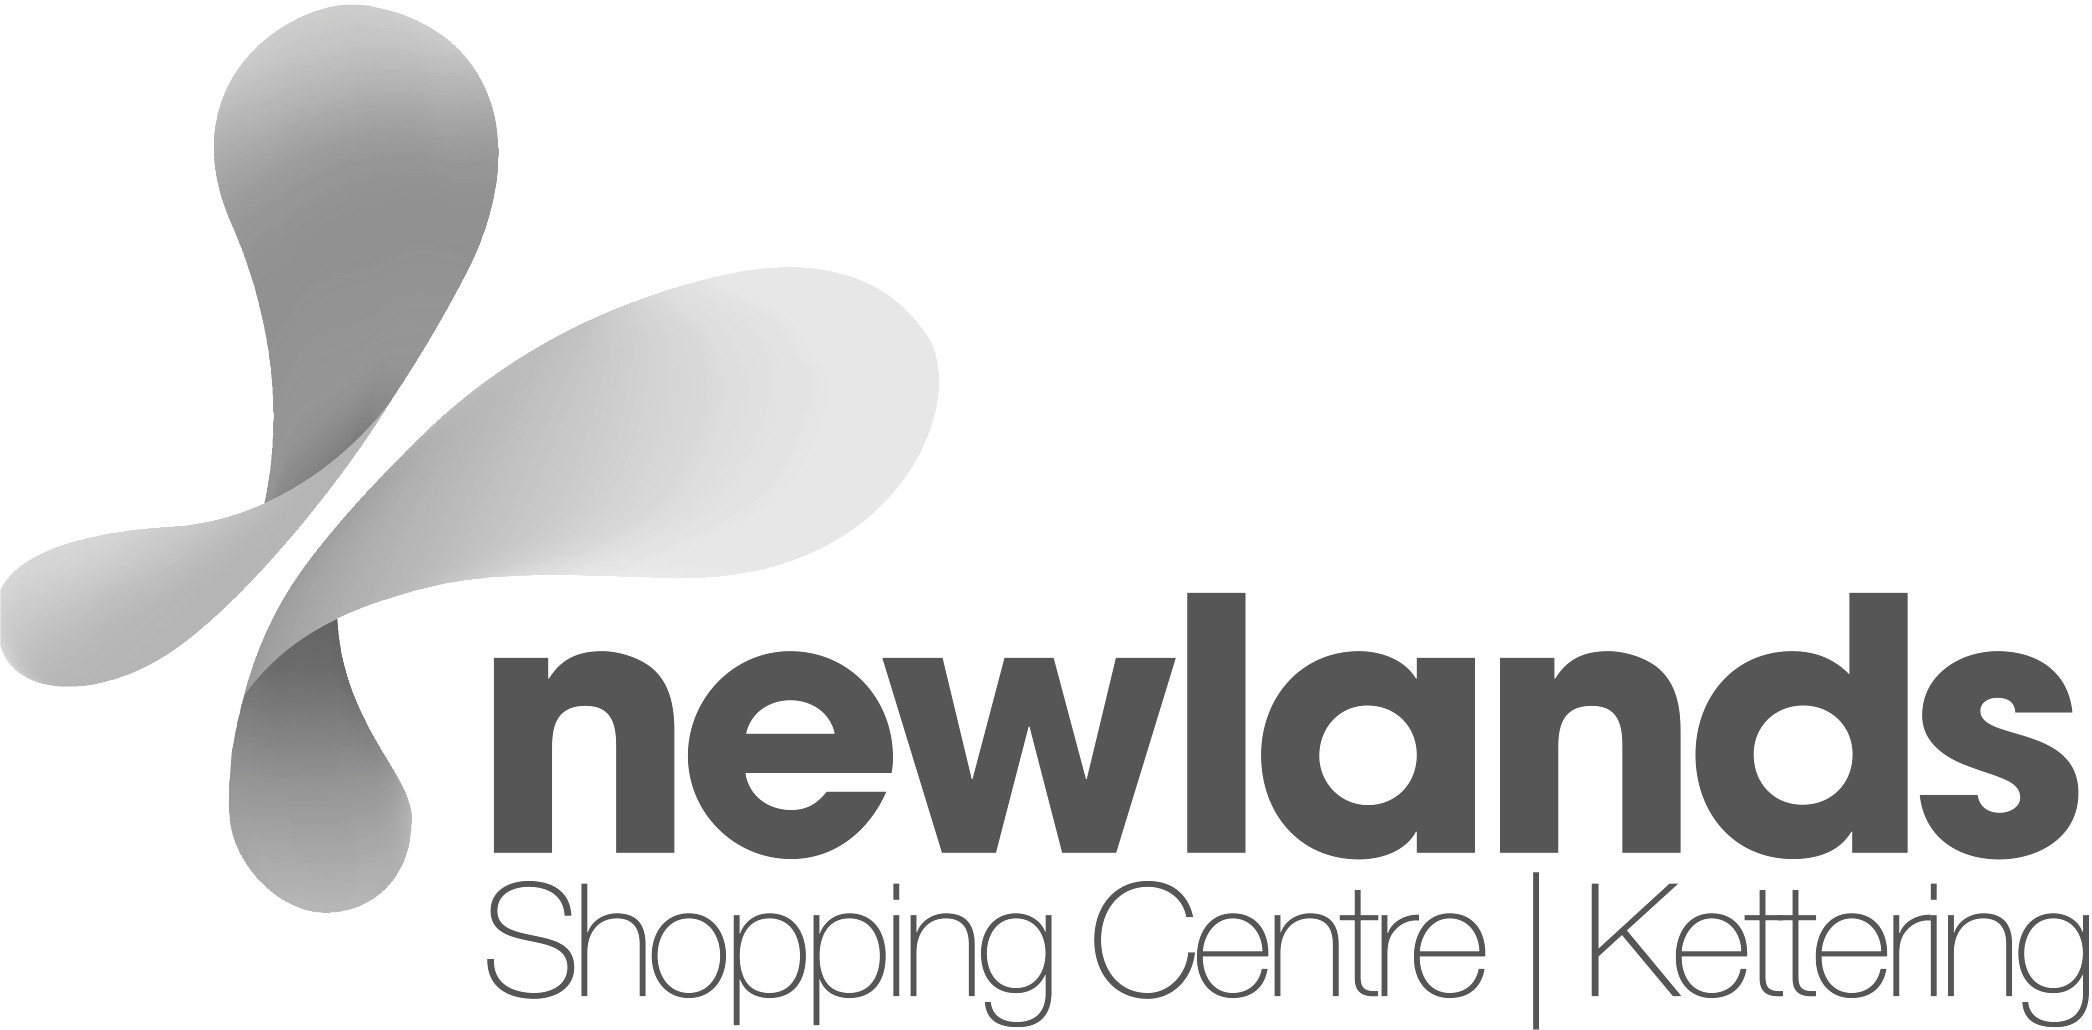 7 Kettering Newlands.jpg